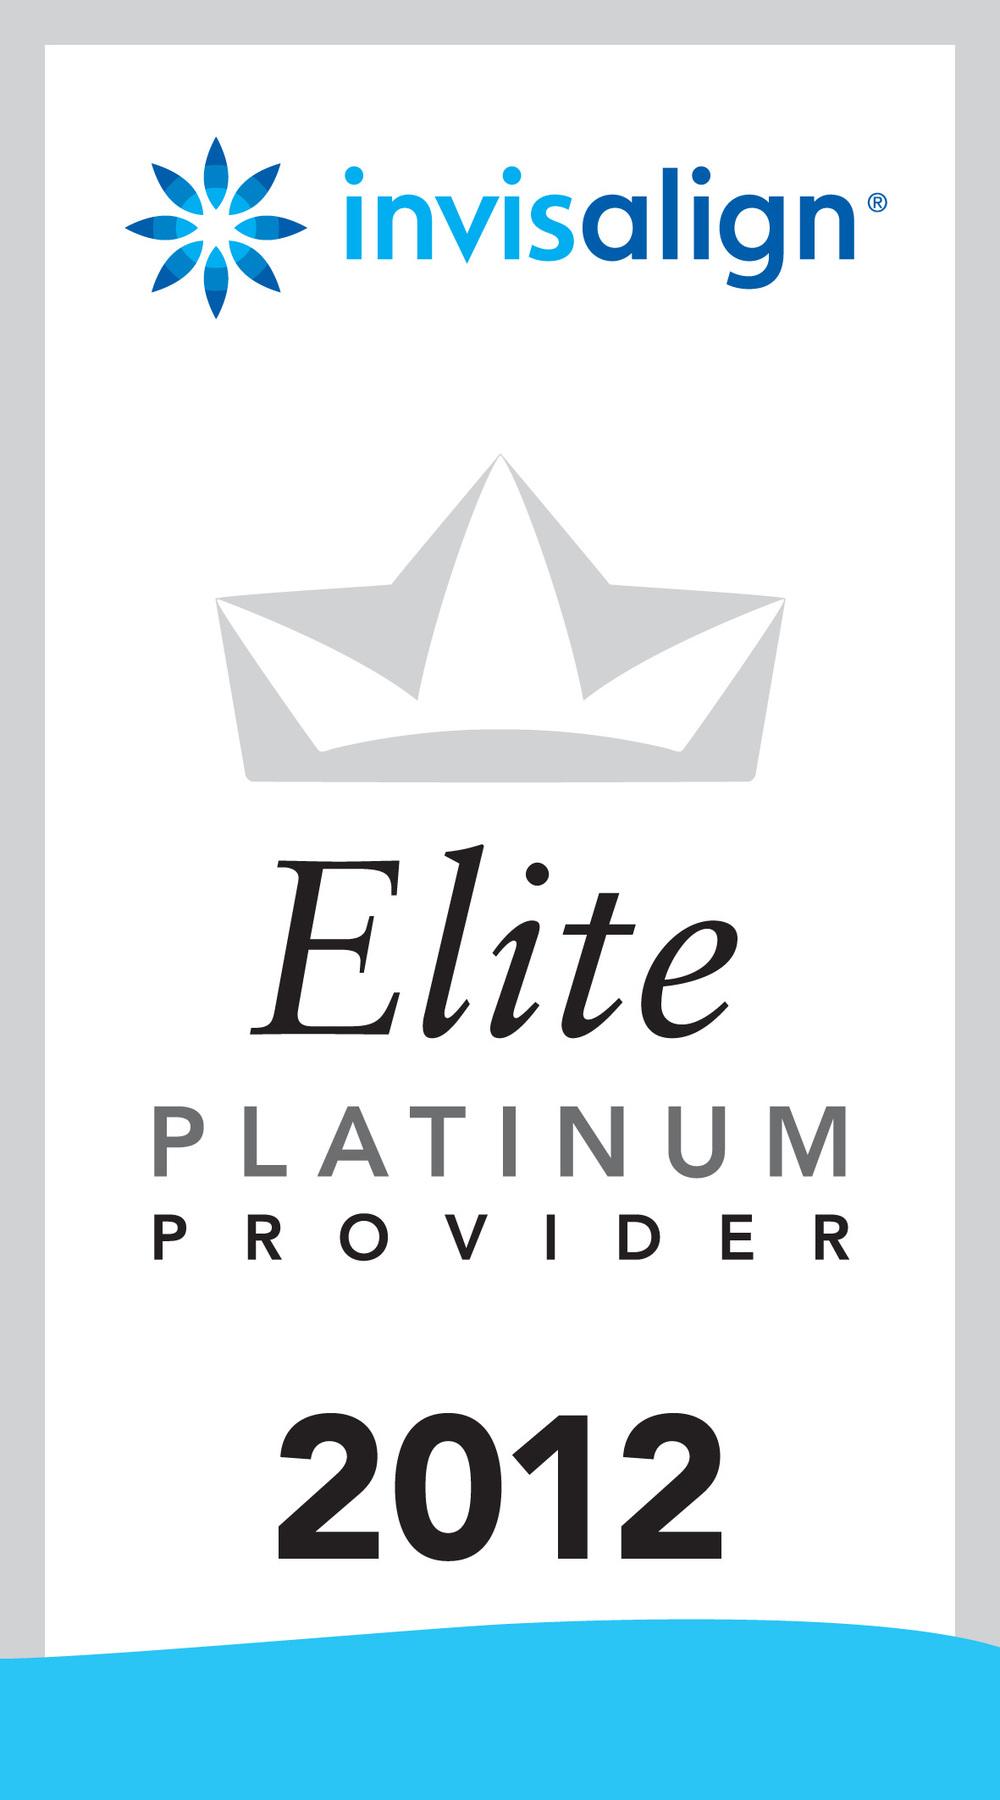 PlatinumElite2012.jpg